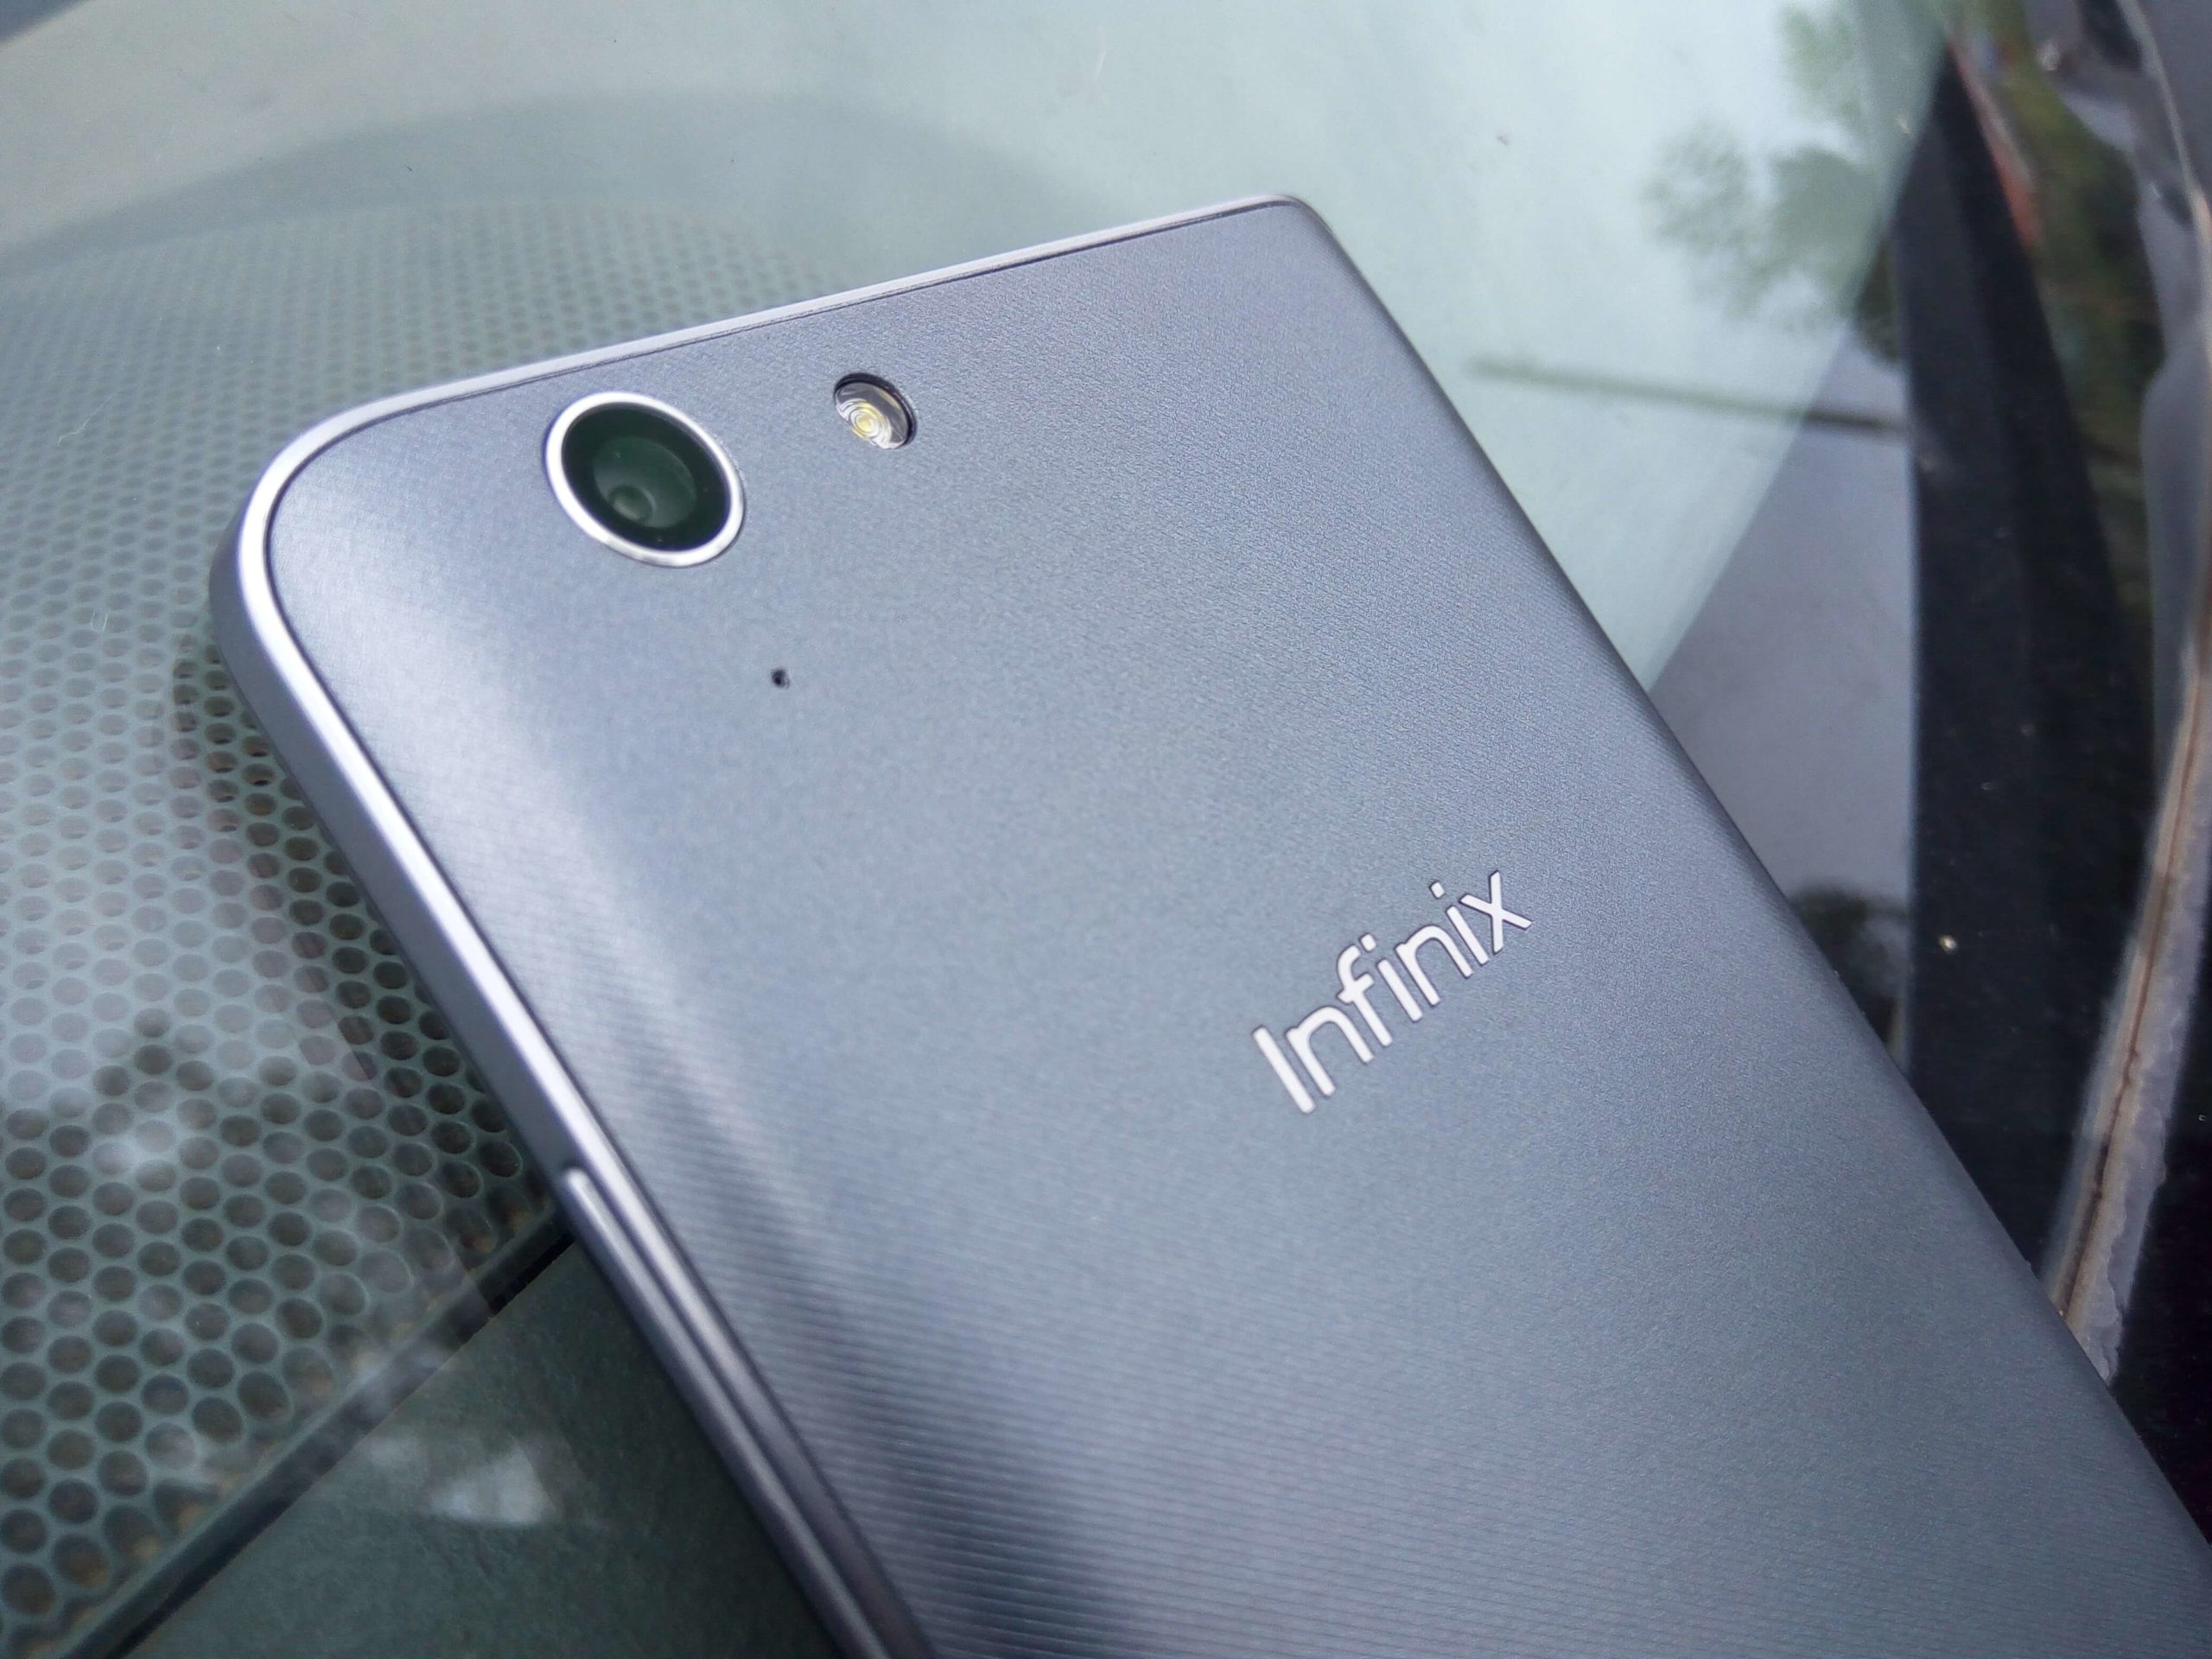 Infinix-Hot-3.jpg